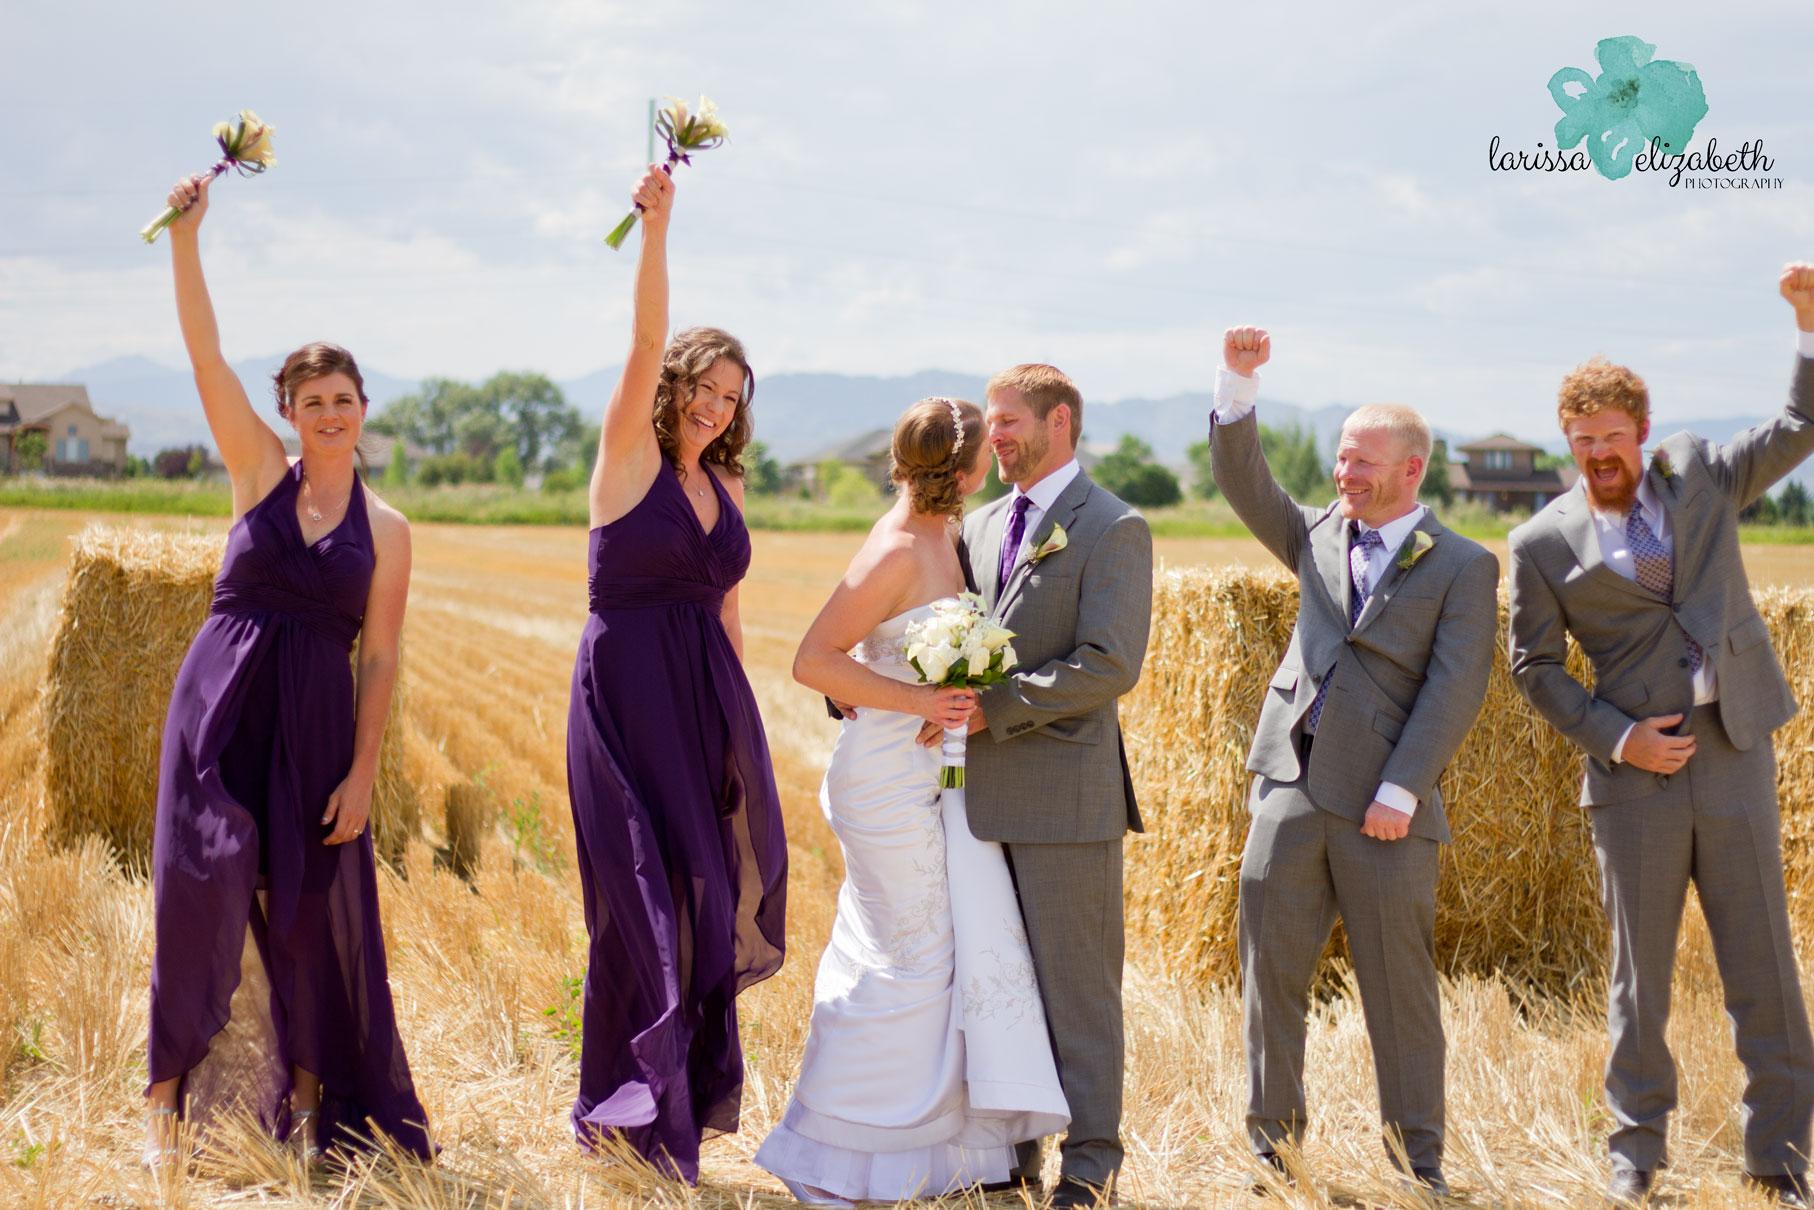 Loveland-Country-Wedding-6